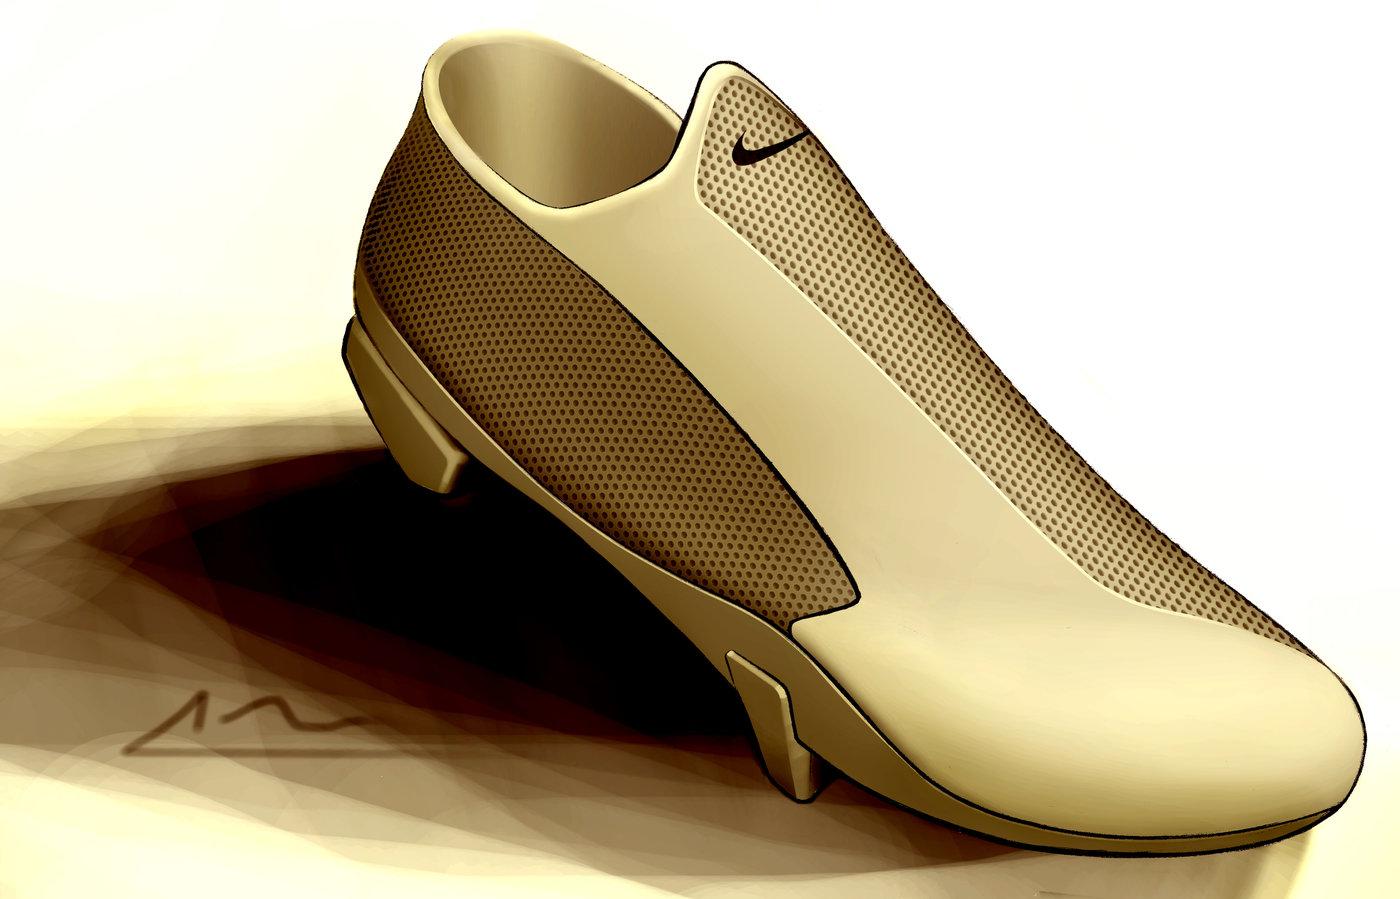 Nike No Laces Concept By Danylo Araujo At Coroflotcom